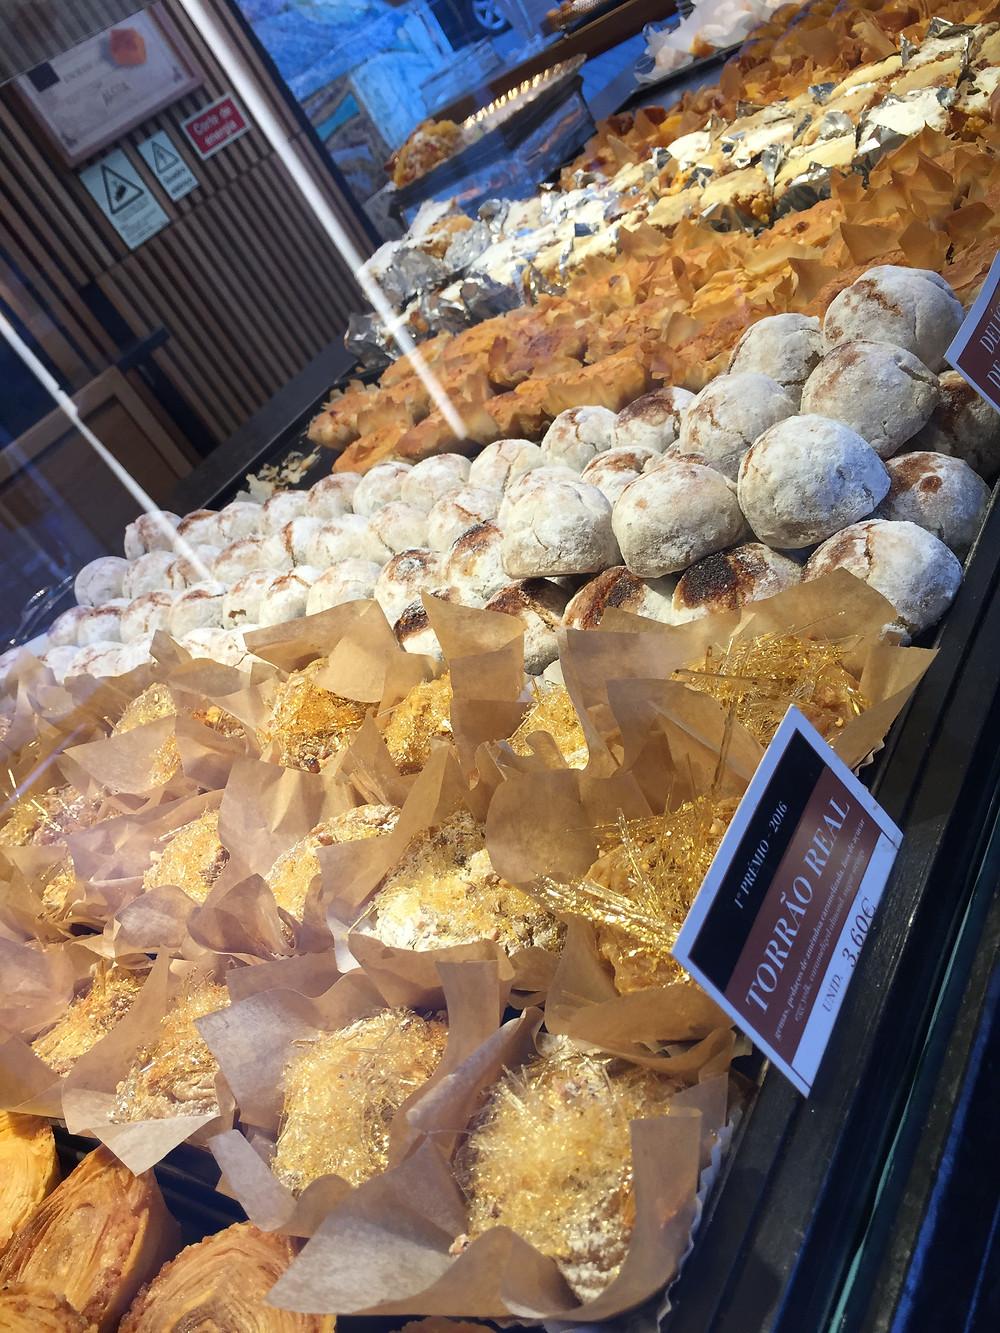 Pastelaria Alcoa - Ordinary Brussels